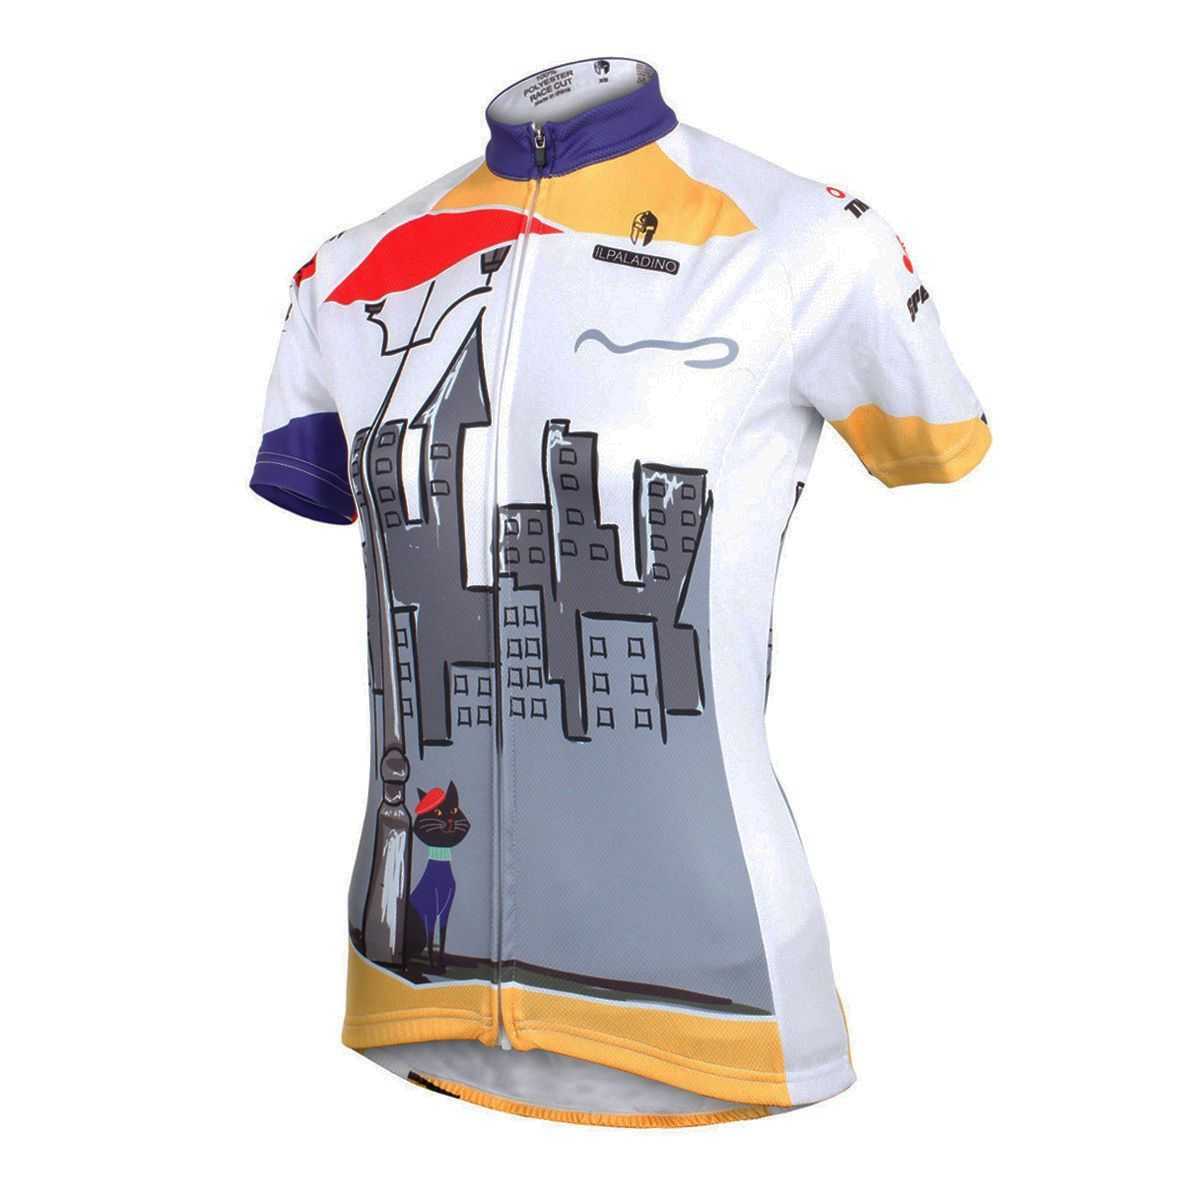 Mountain Bike Apparel Cycling Apparel Brands Cycling Apparel Near